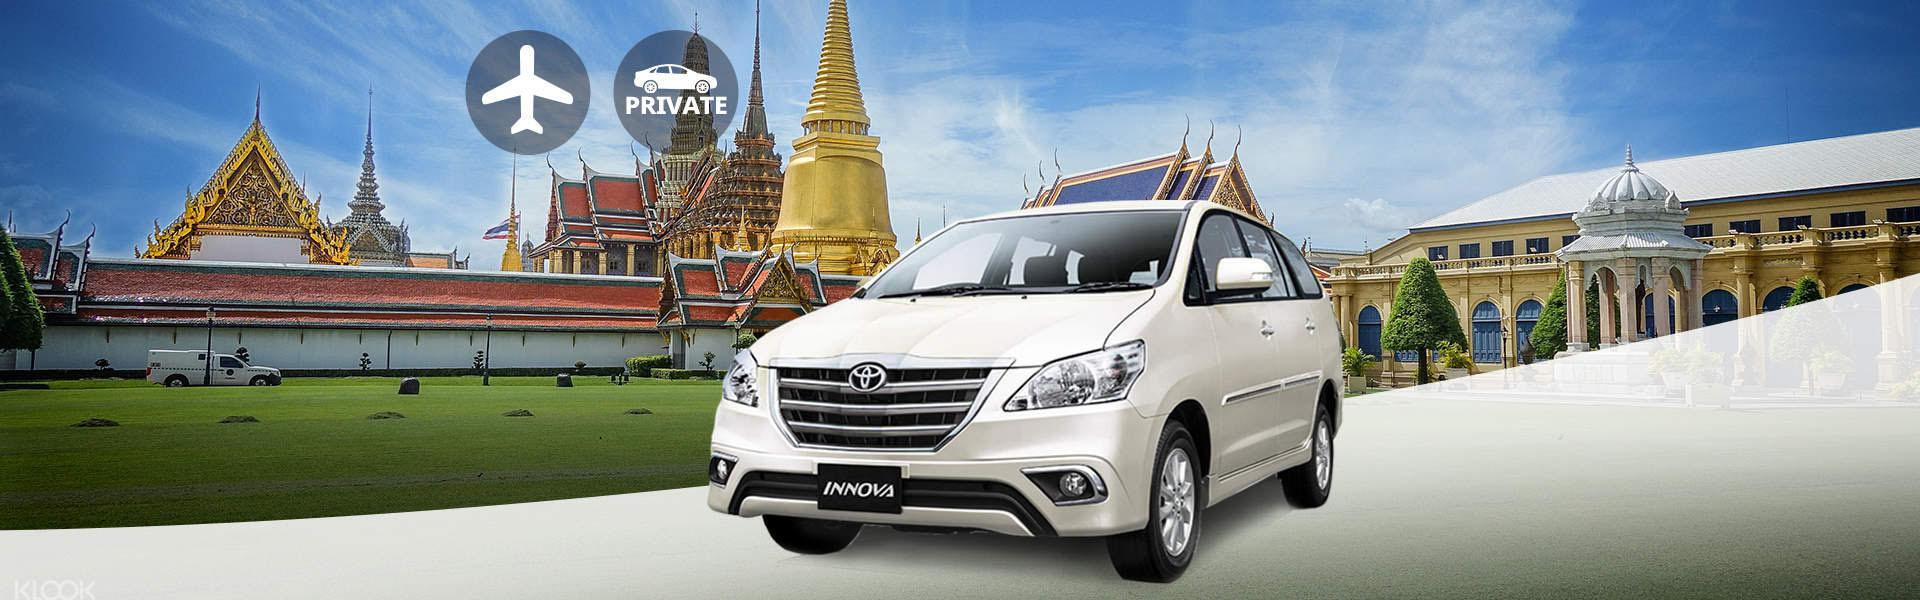 thue-xe-rieng-dua-don-tu-san-bay-suvarnabhumi-ve-bangkok